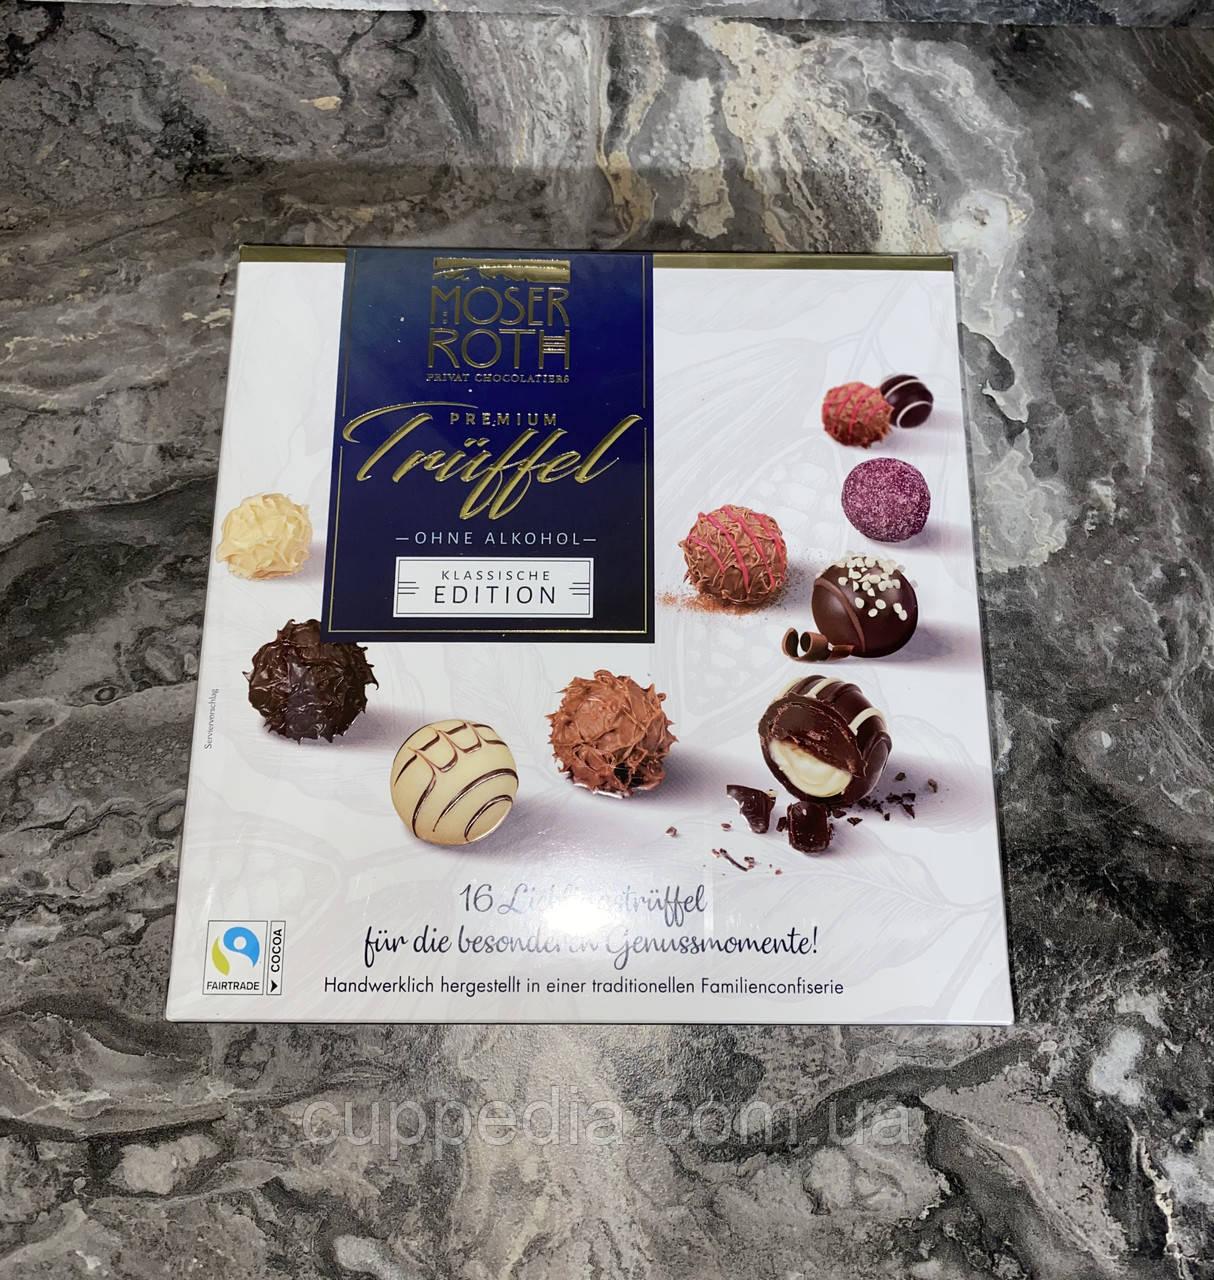 Конфеты Moser Roth premium Truffel 200 грм